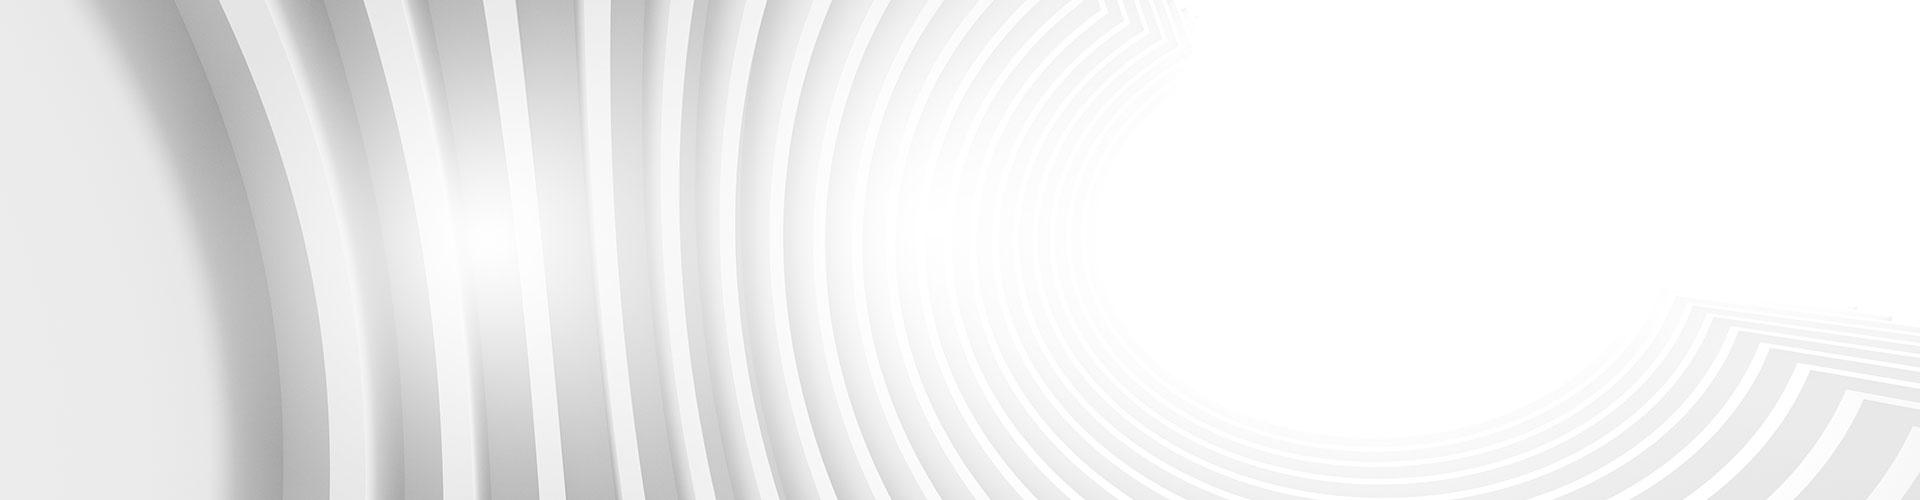 bannergraphic-background-7